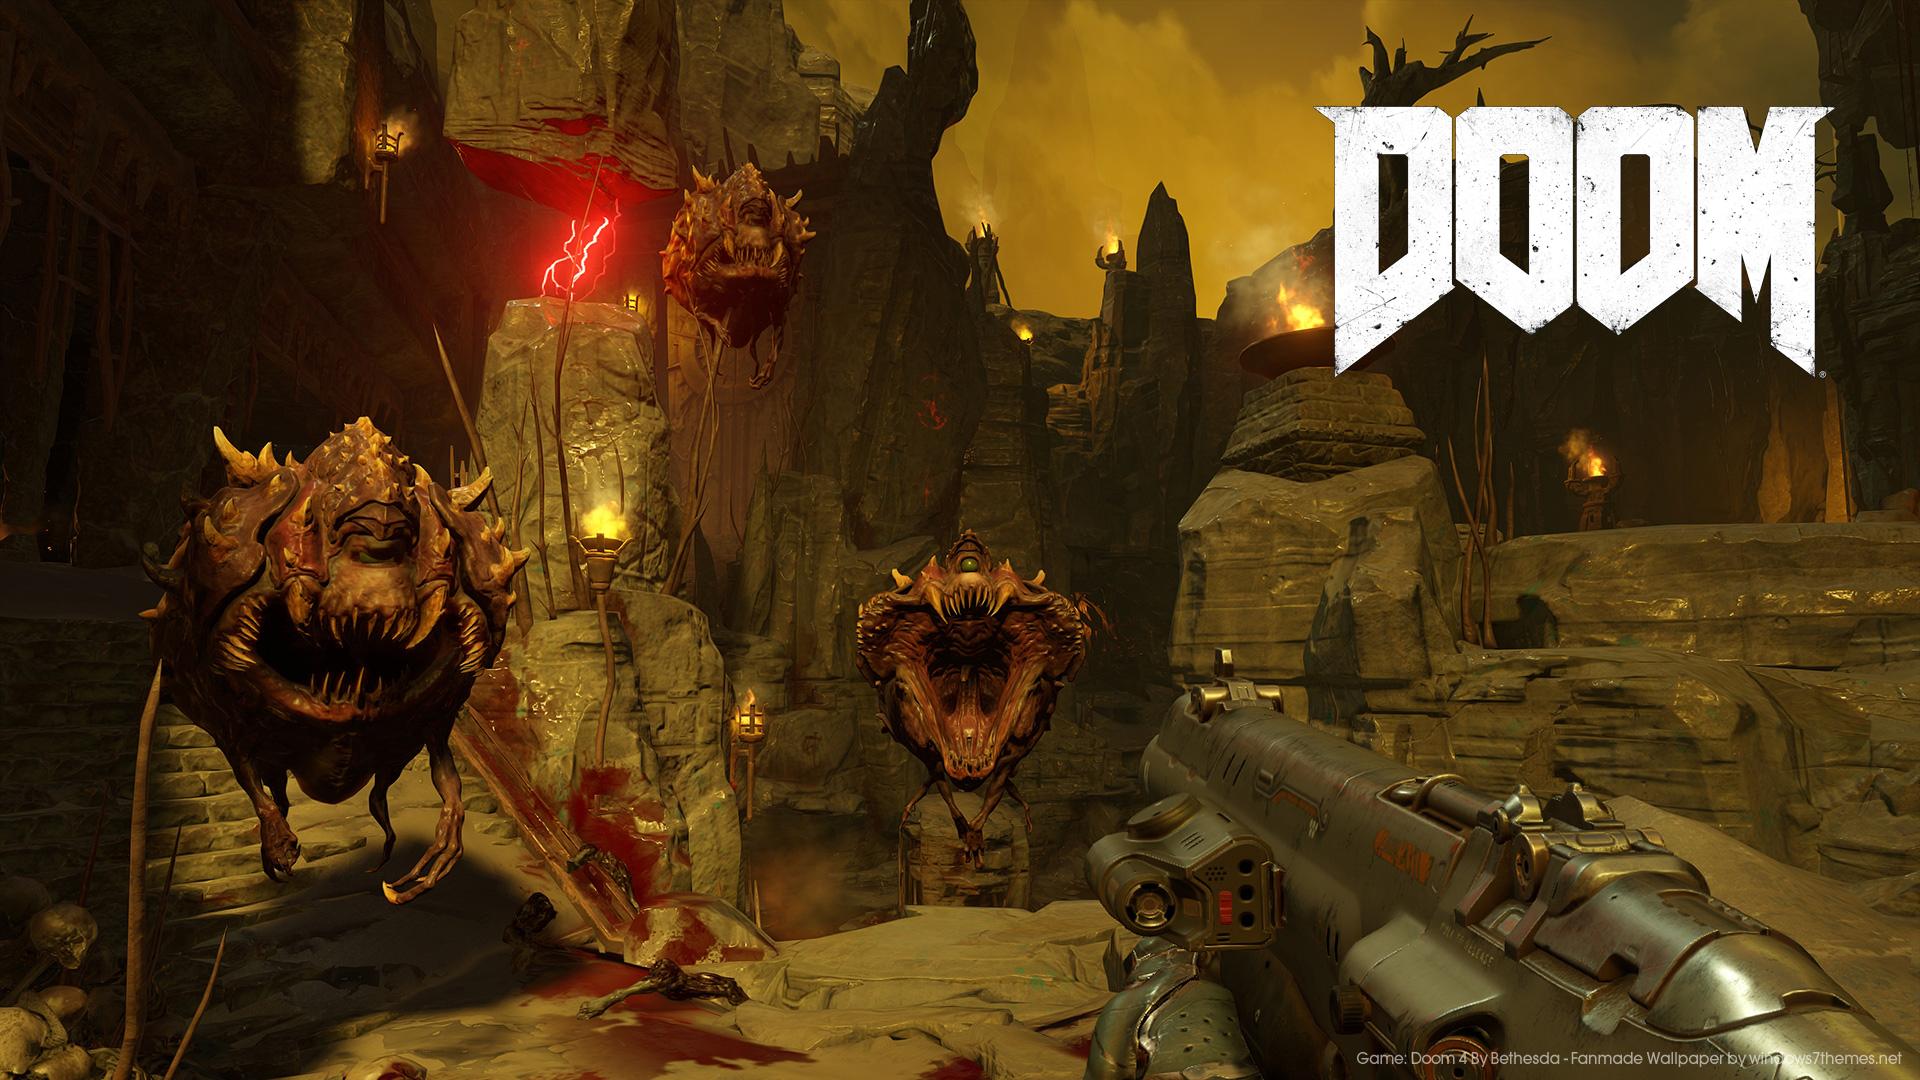 Free Download Download Doom 4 Wallpaper 3 1920x1080 For